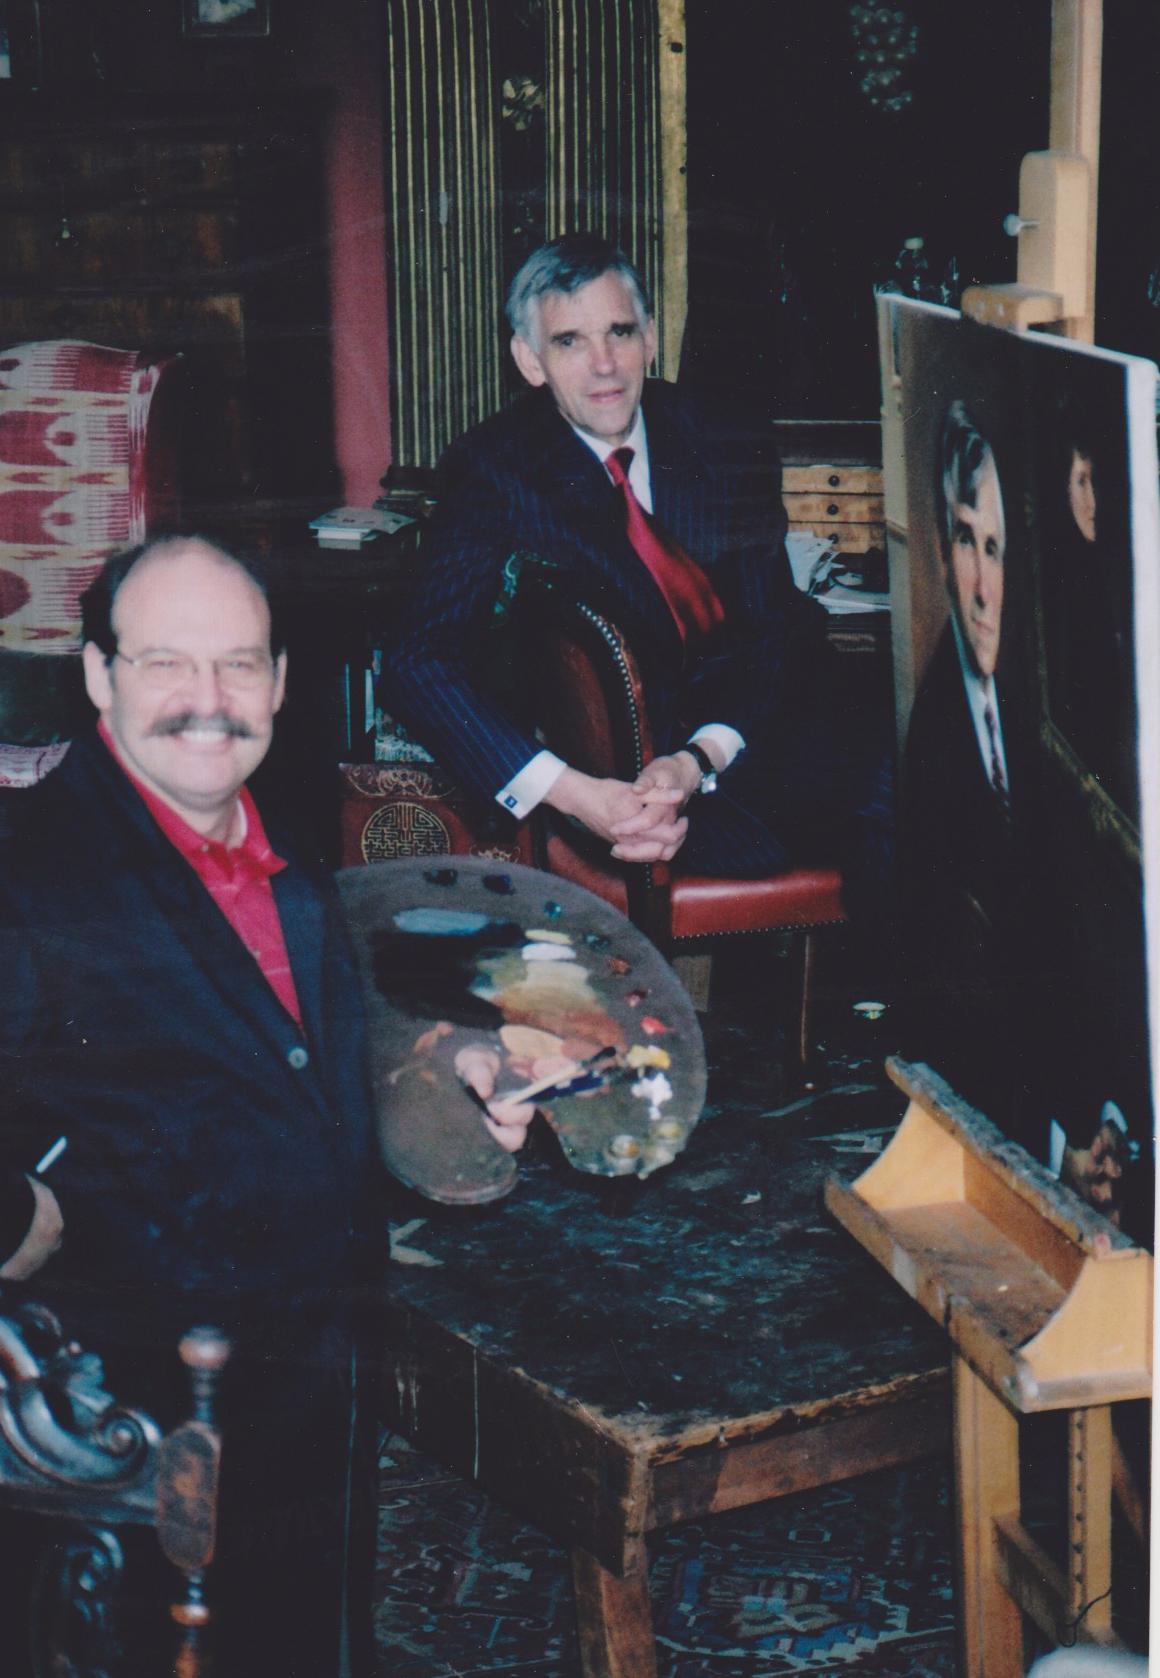 Del-Priore-painting-George-Orman-in-Sergant-Sudio.jpg